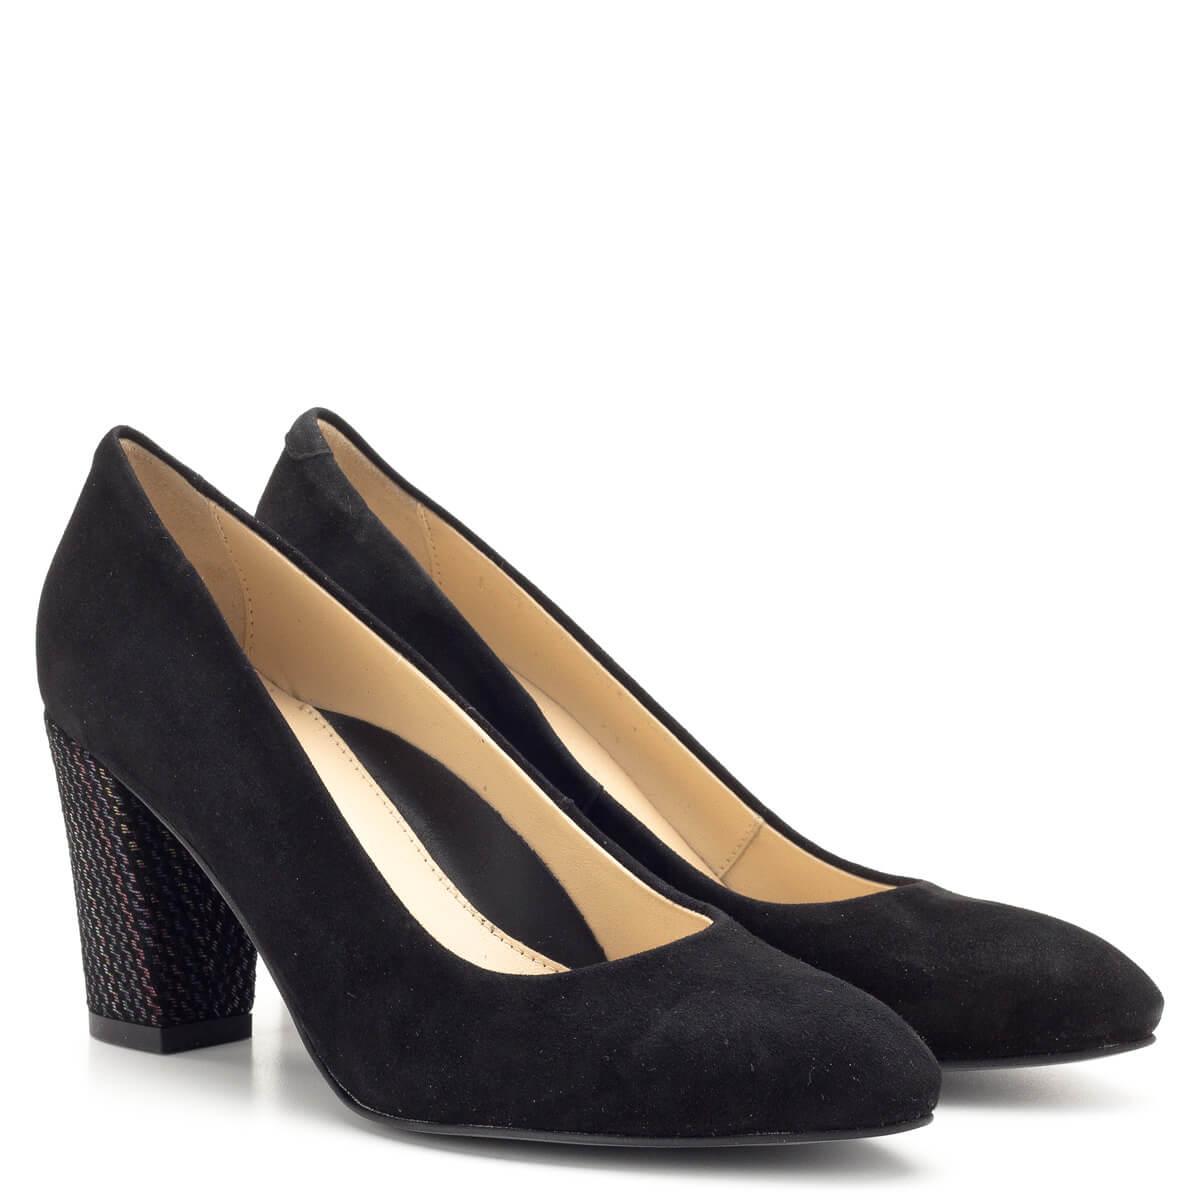 7e1ebe11ce Clarette cipők - Elegáns női bőr cipők, alkalmi cipők